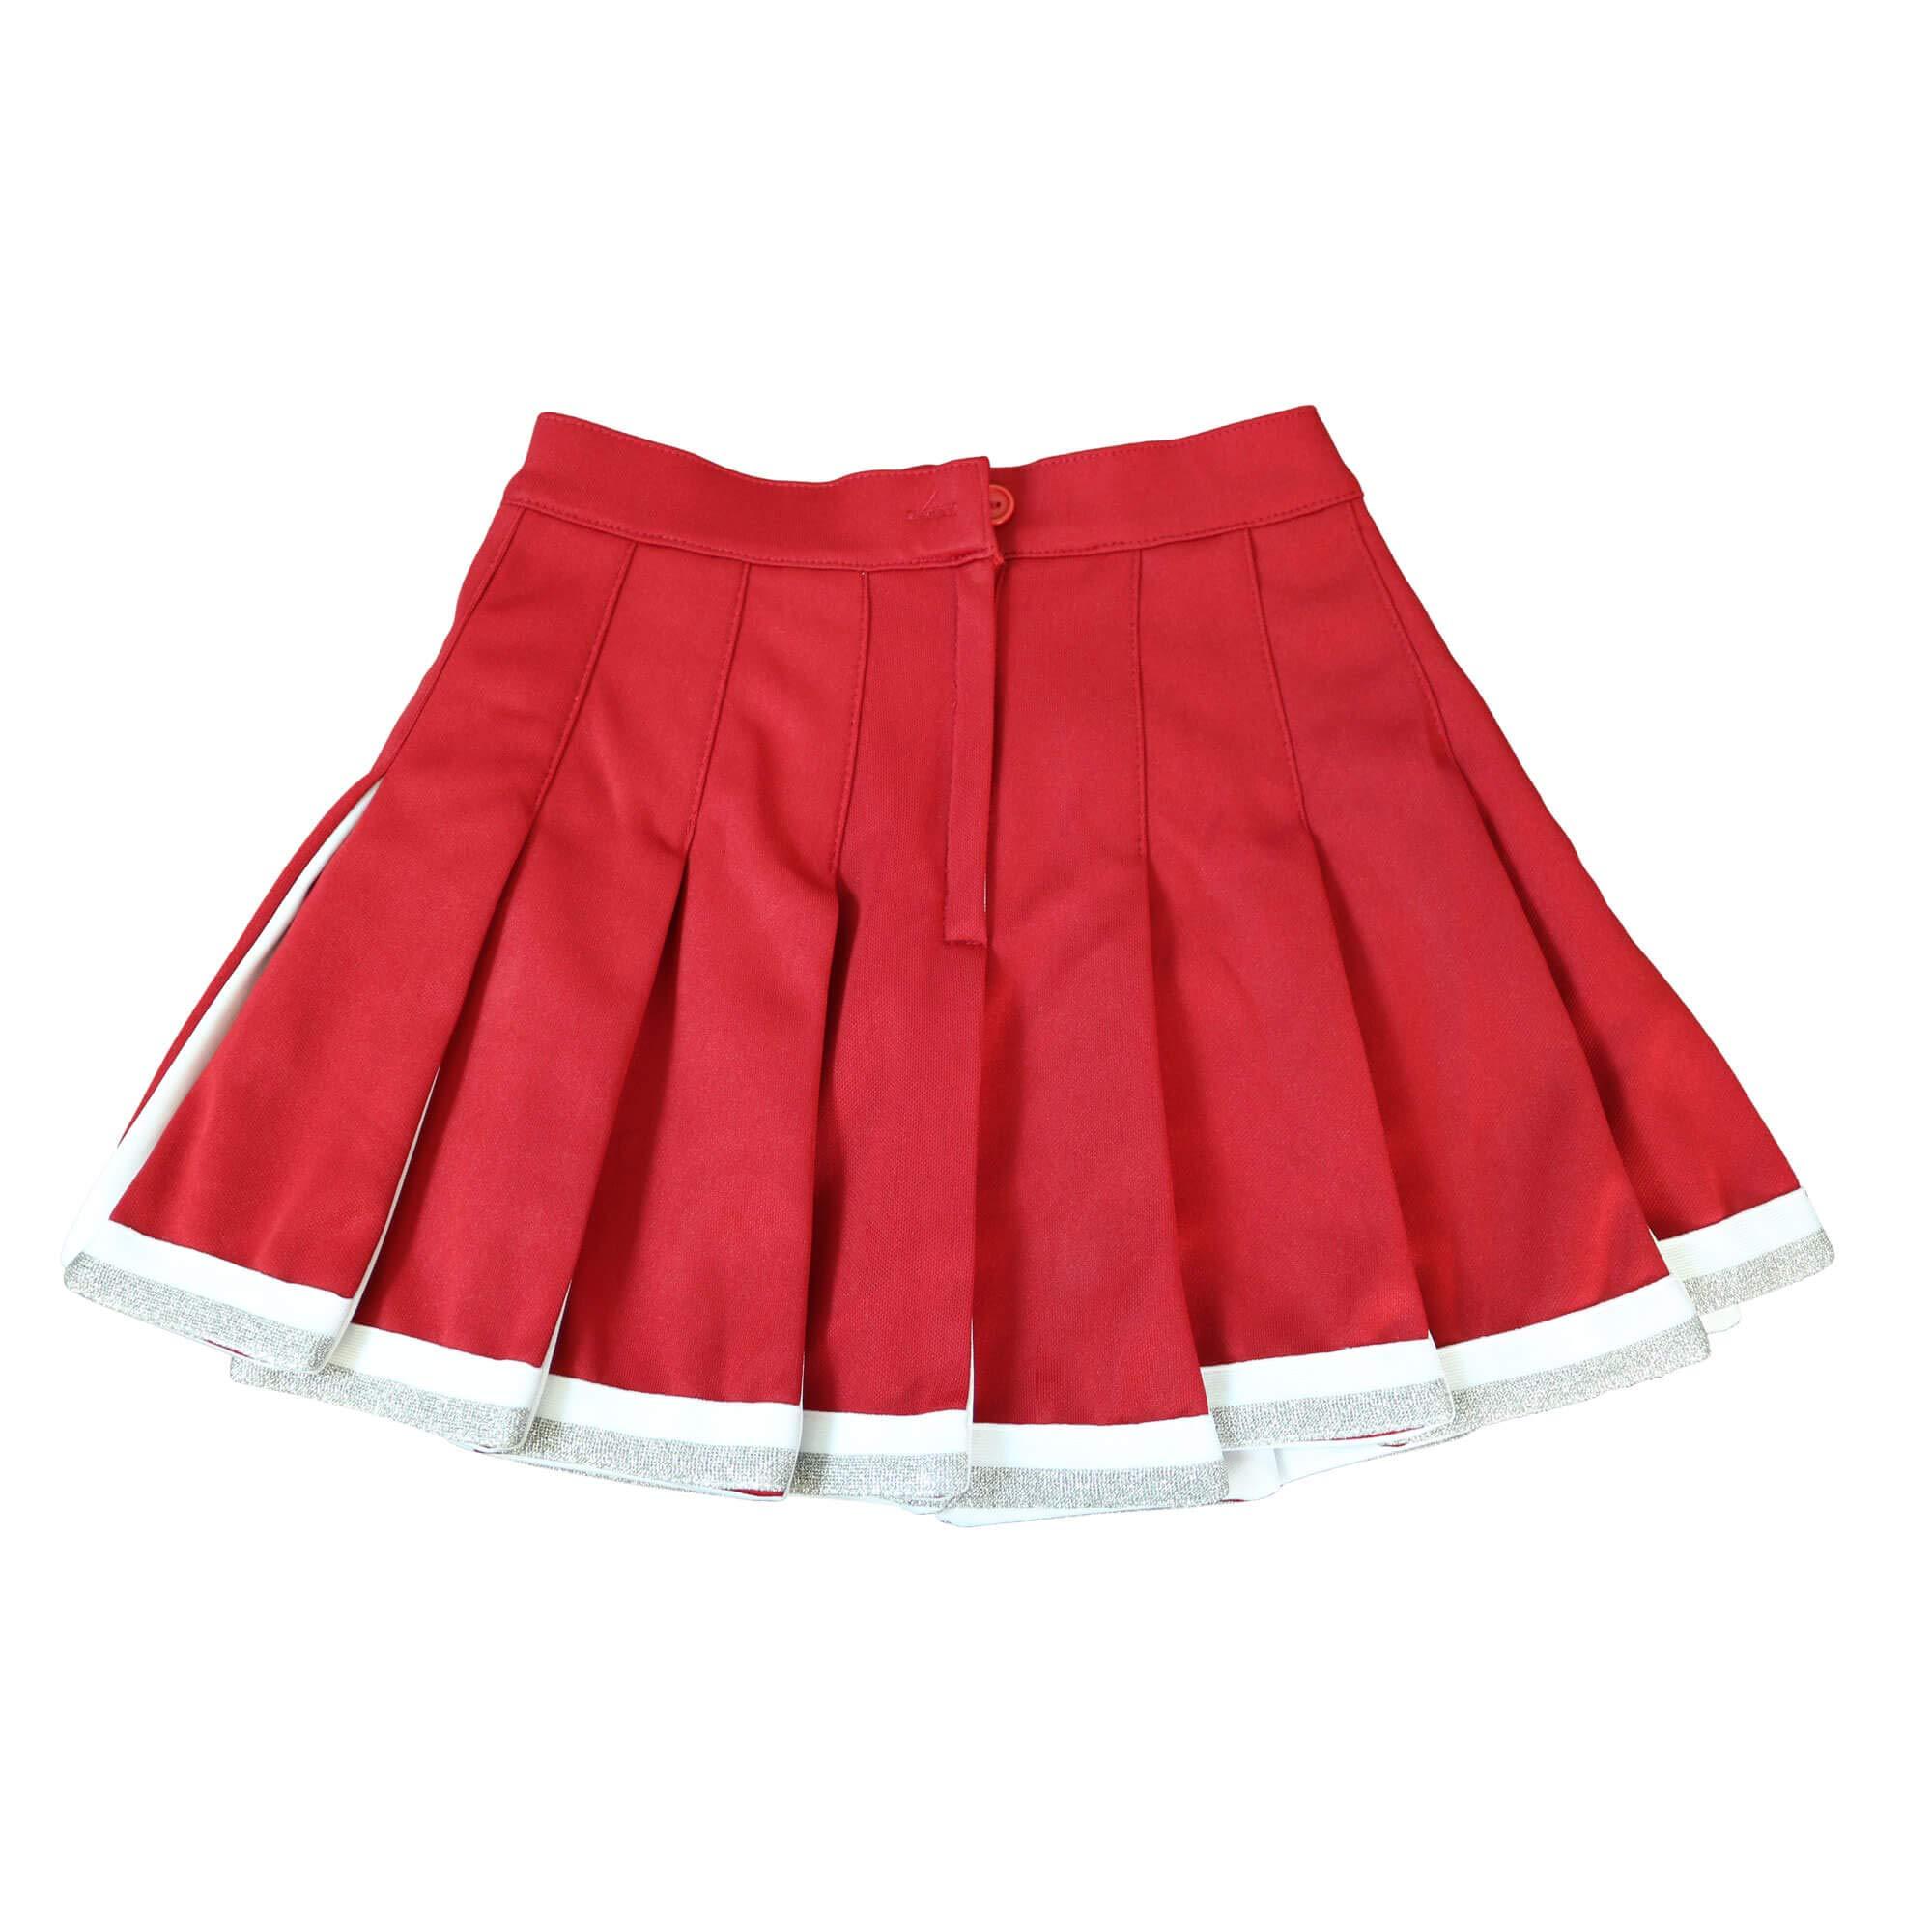 Danzcue Child Cheerleading Pleated Skirt, Scarlet/White, X-Small